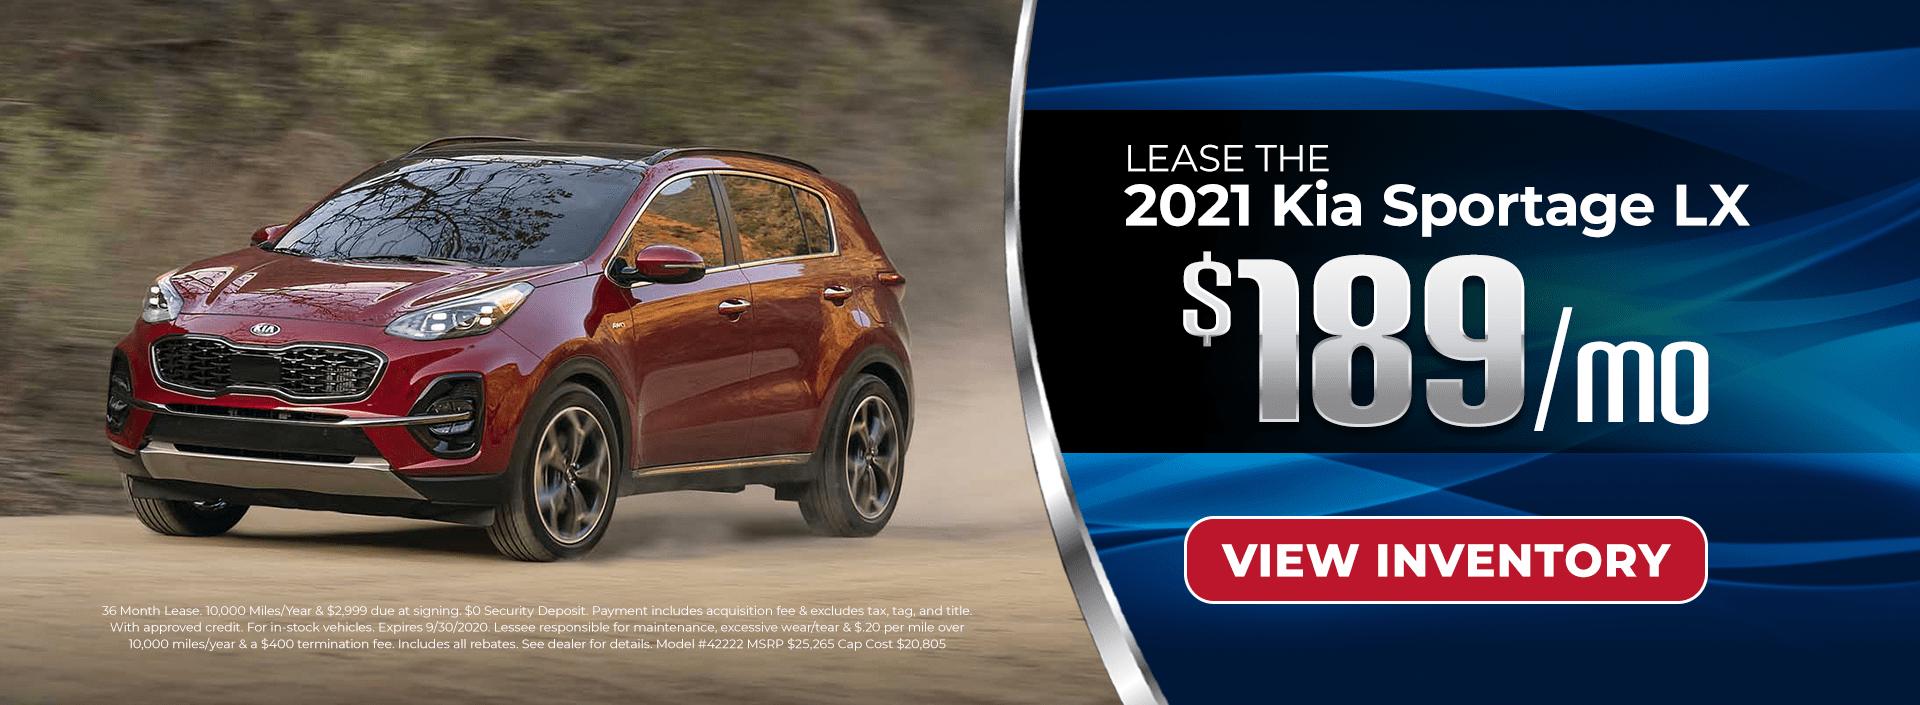 Lease 2021 Sportage for $189/mo in Atlanta, GA